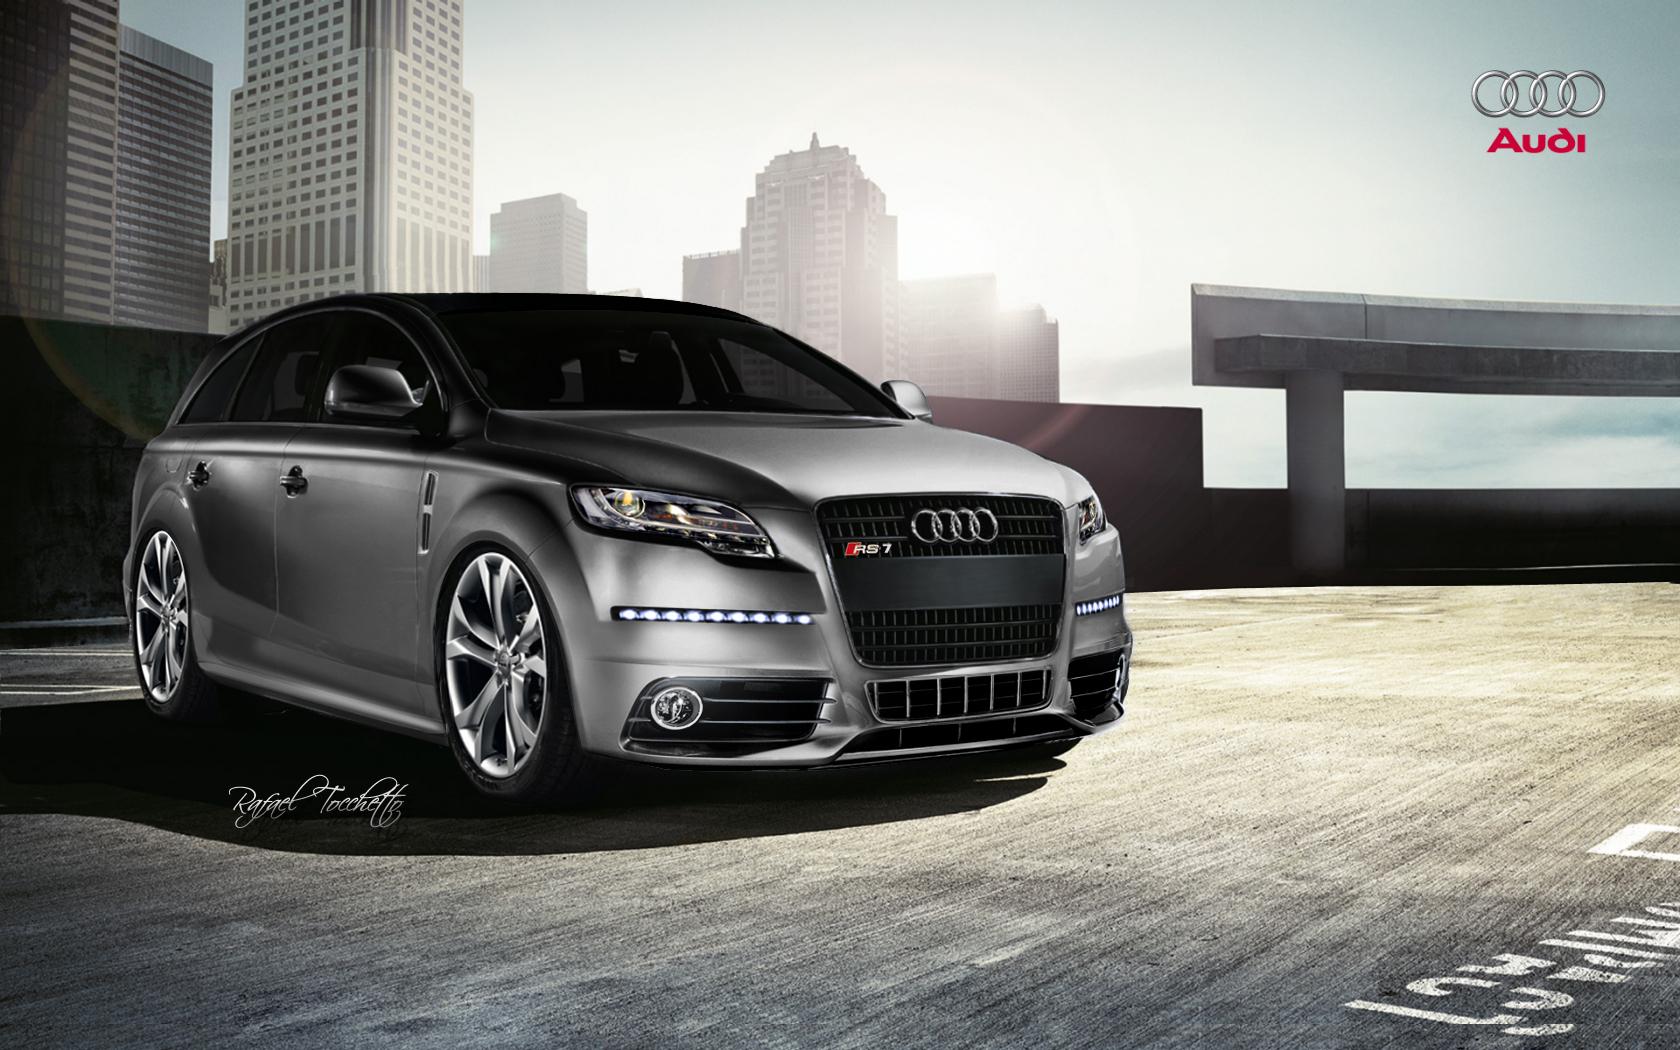 Audi Rs7 Audi Fond D Ecran 11786014 Fanpop